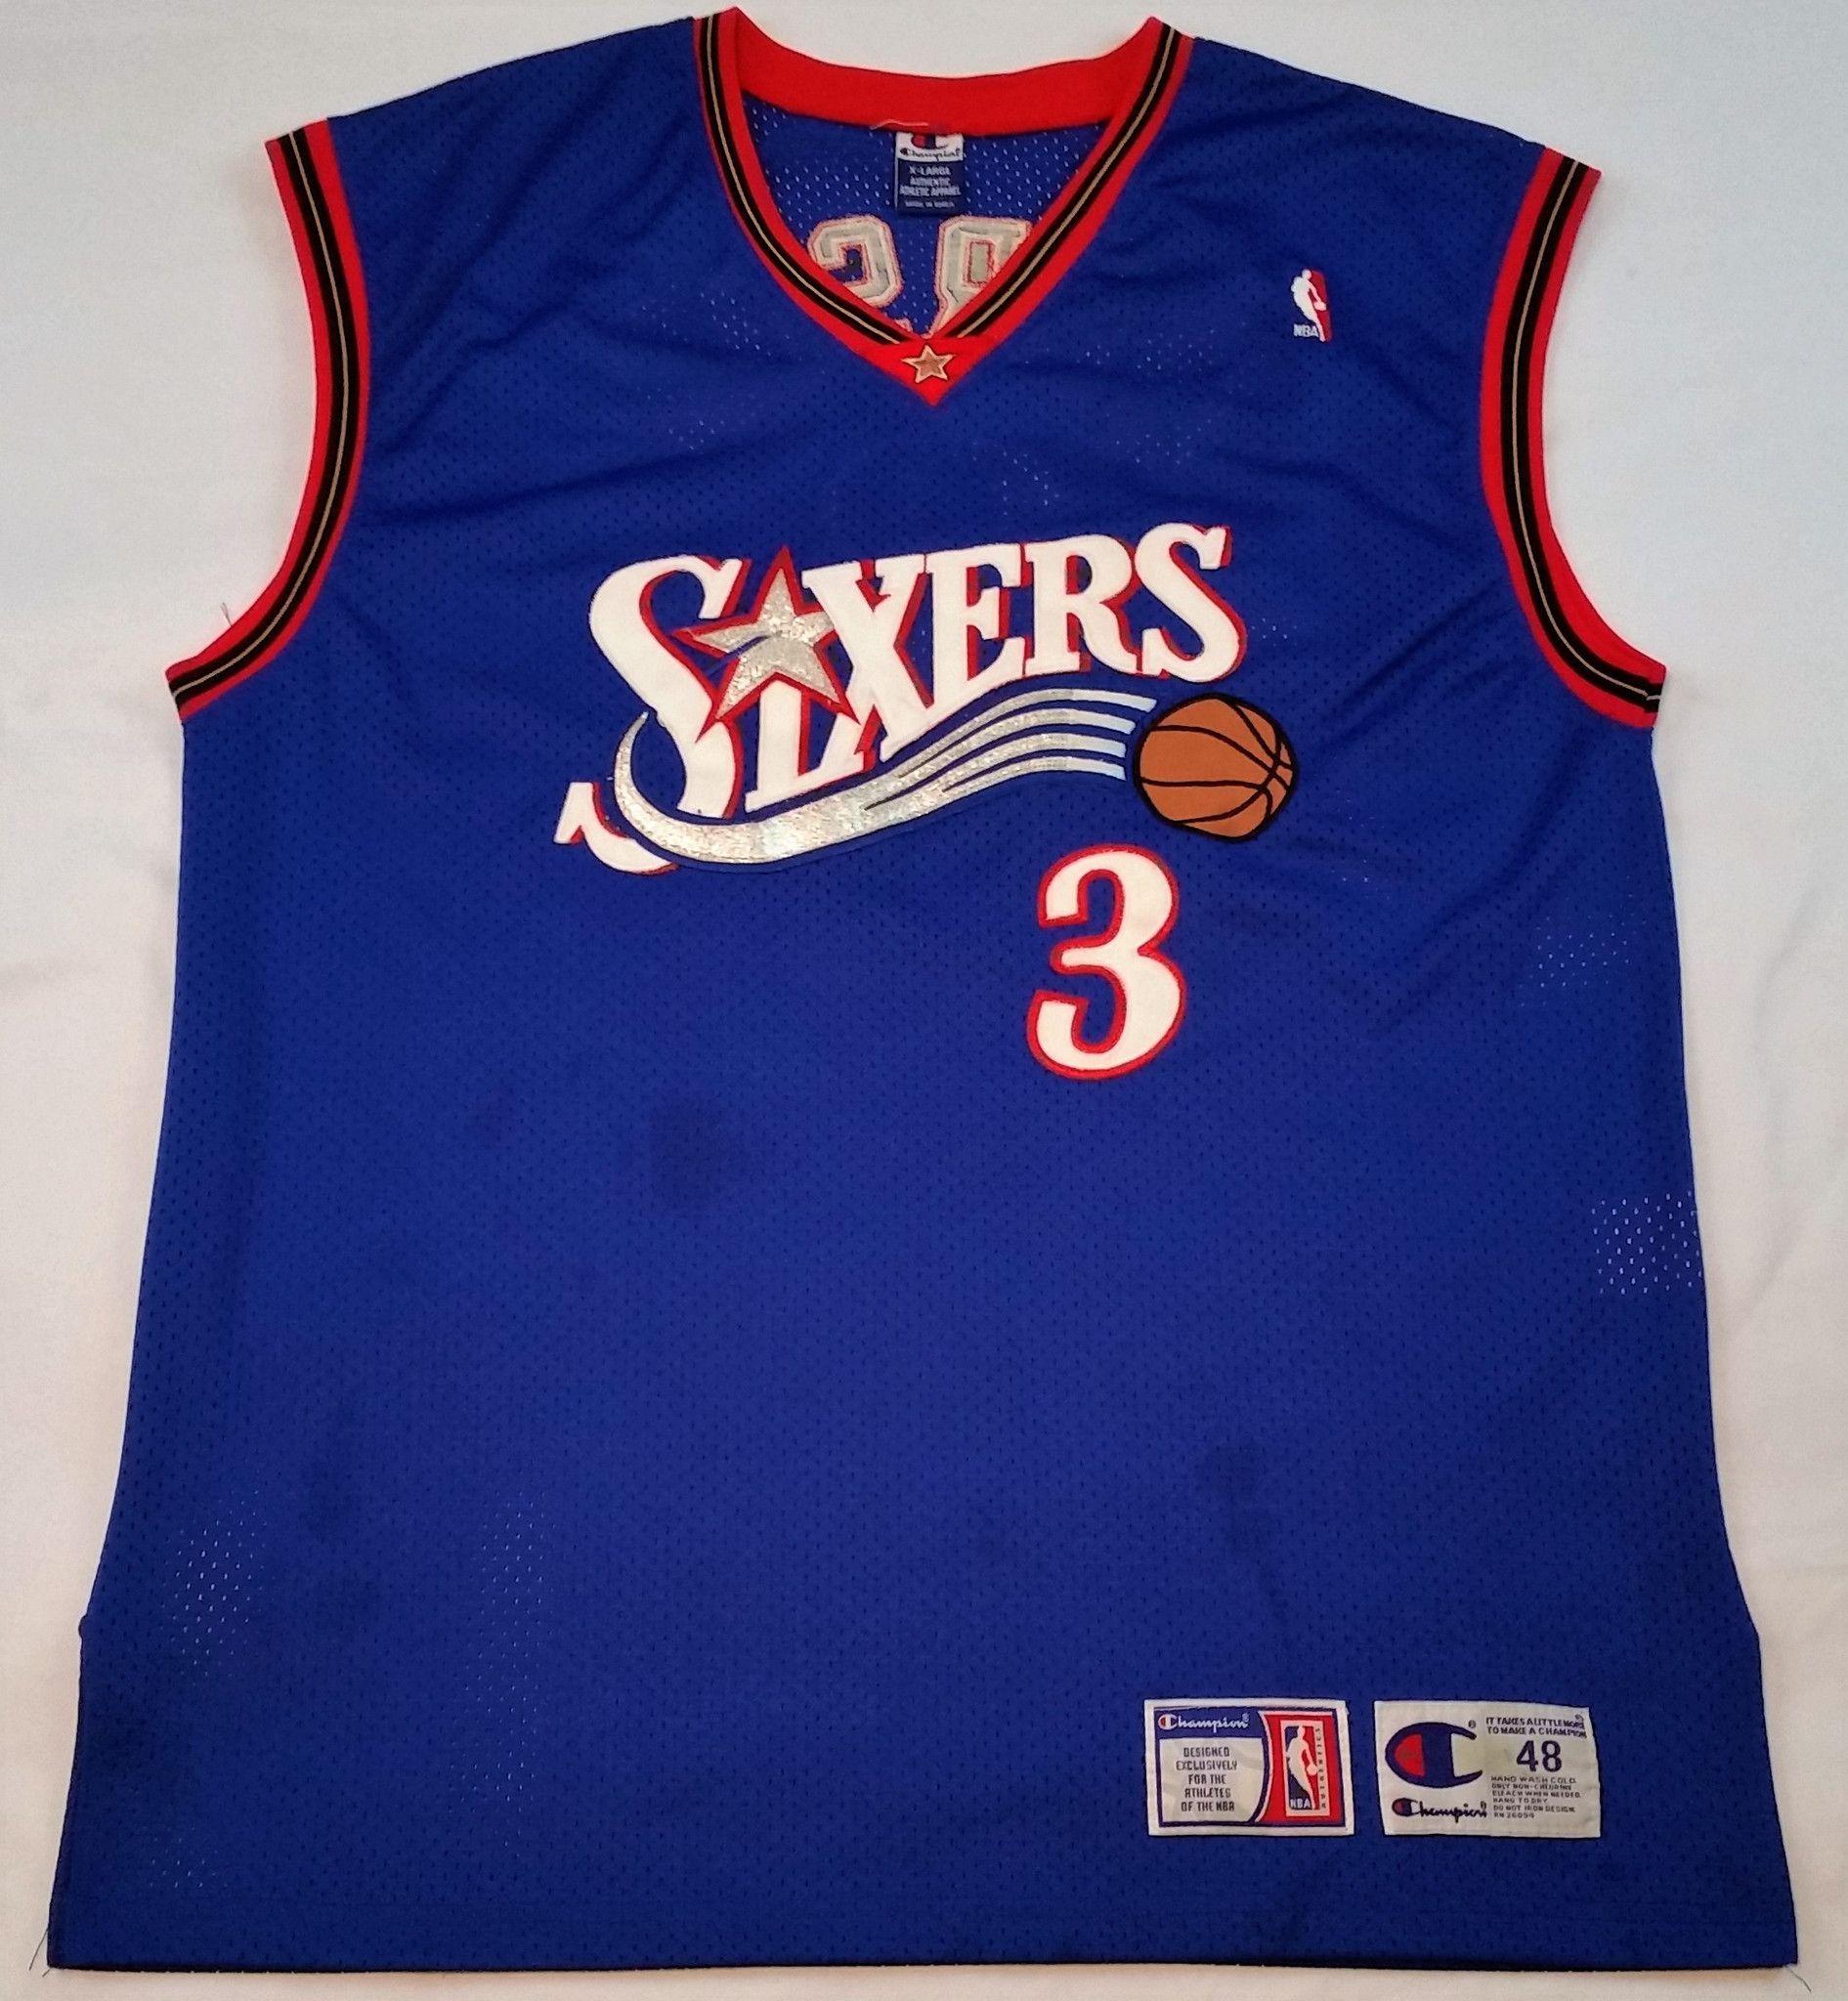 Vintage 90s RARE NBA Philadelphia 76ers Sixers Star Player Full Printed Nets Jersey Shirt Rc5jTc